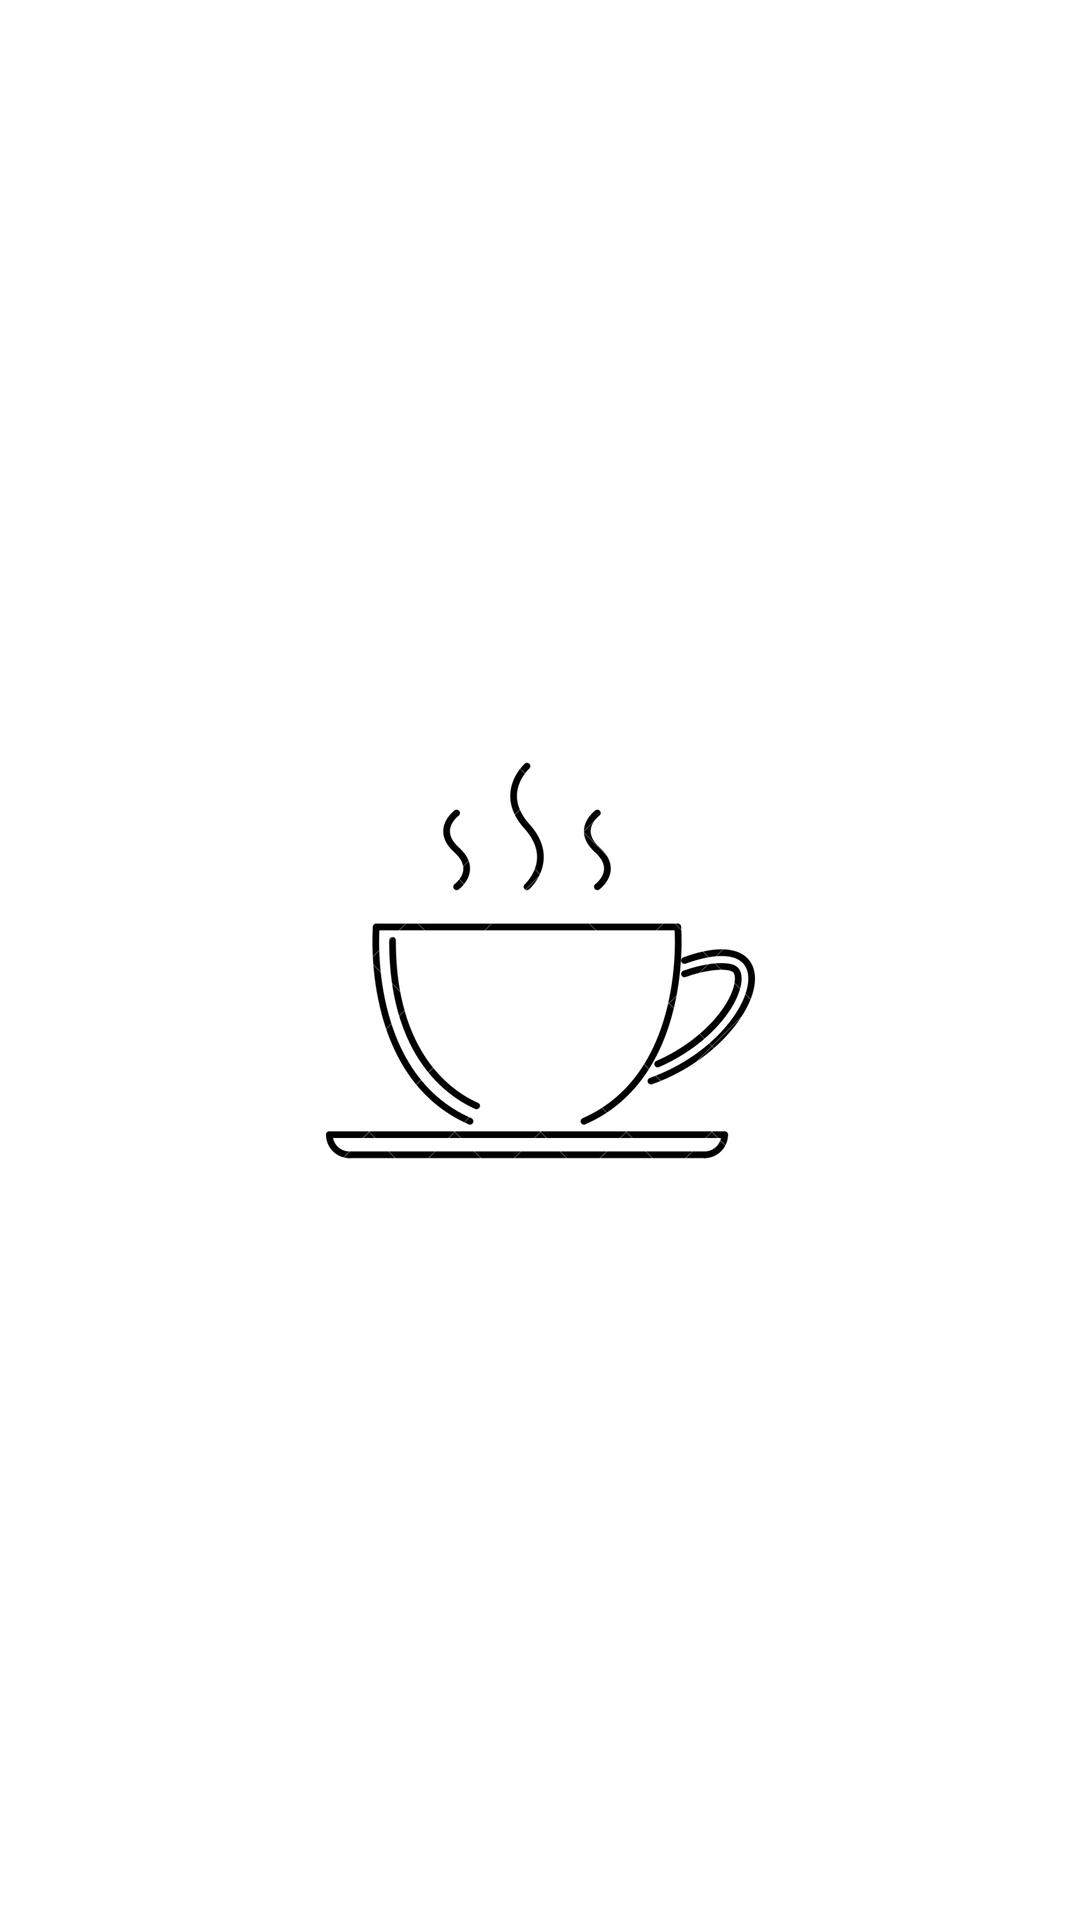 Coffee Coffee Art Drawing Coffee Icon Easy Drawings